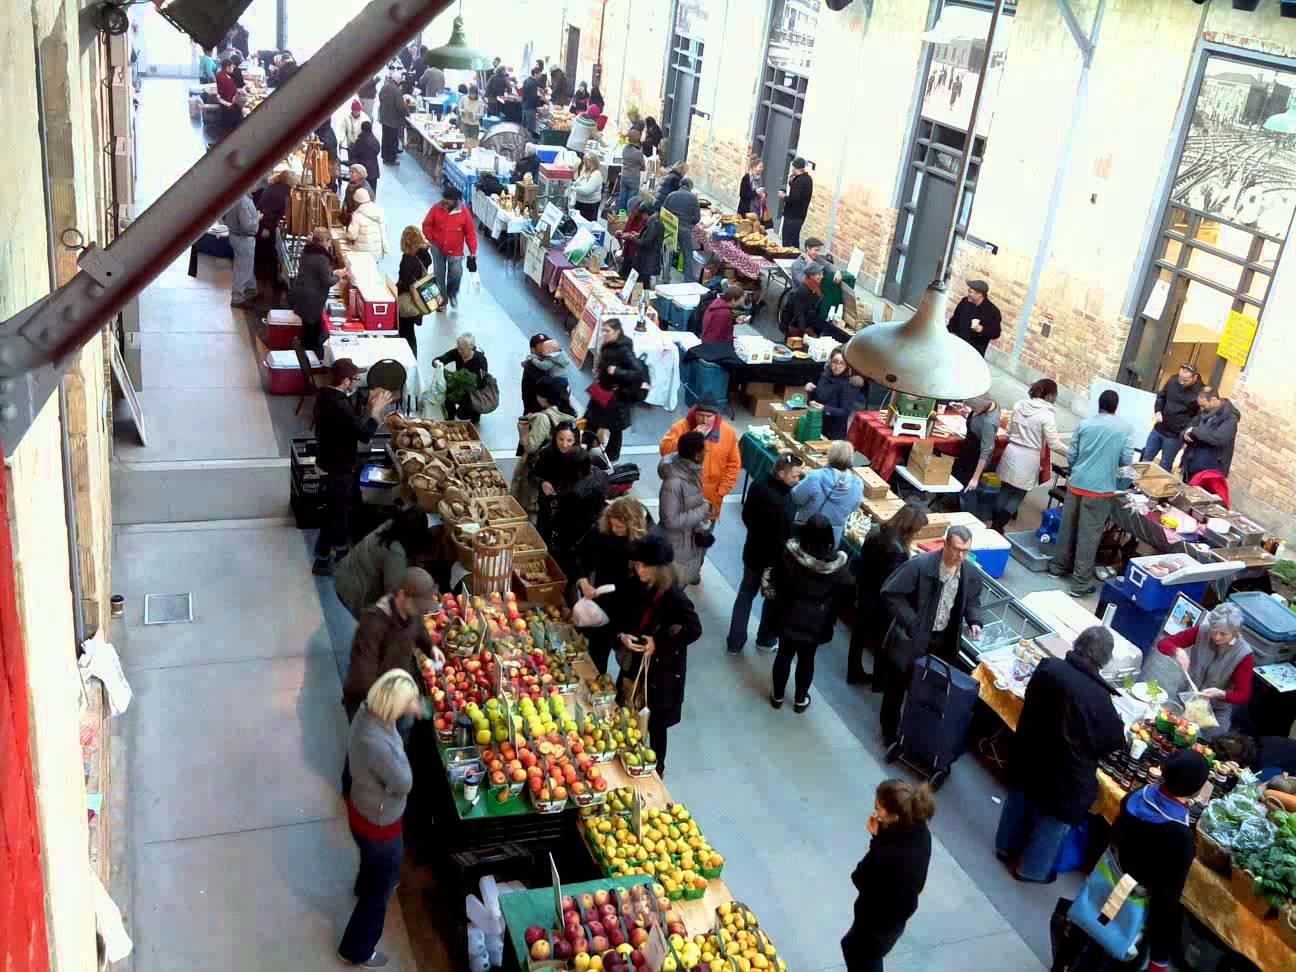 Wychwood Farmers Market